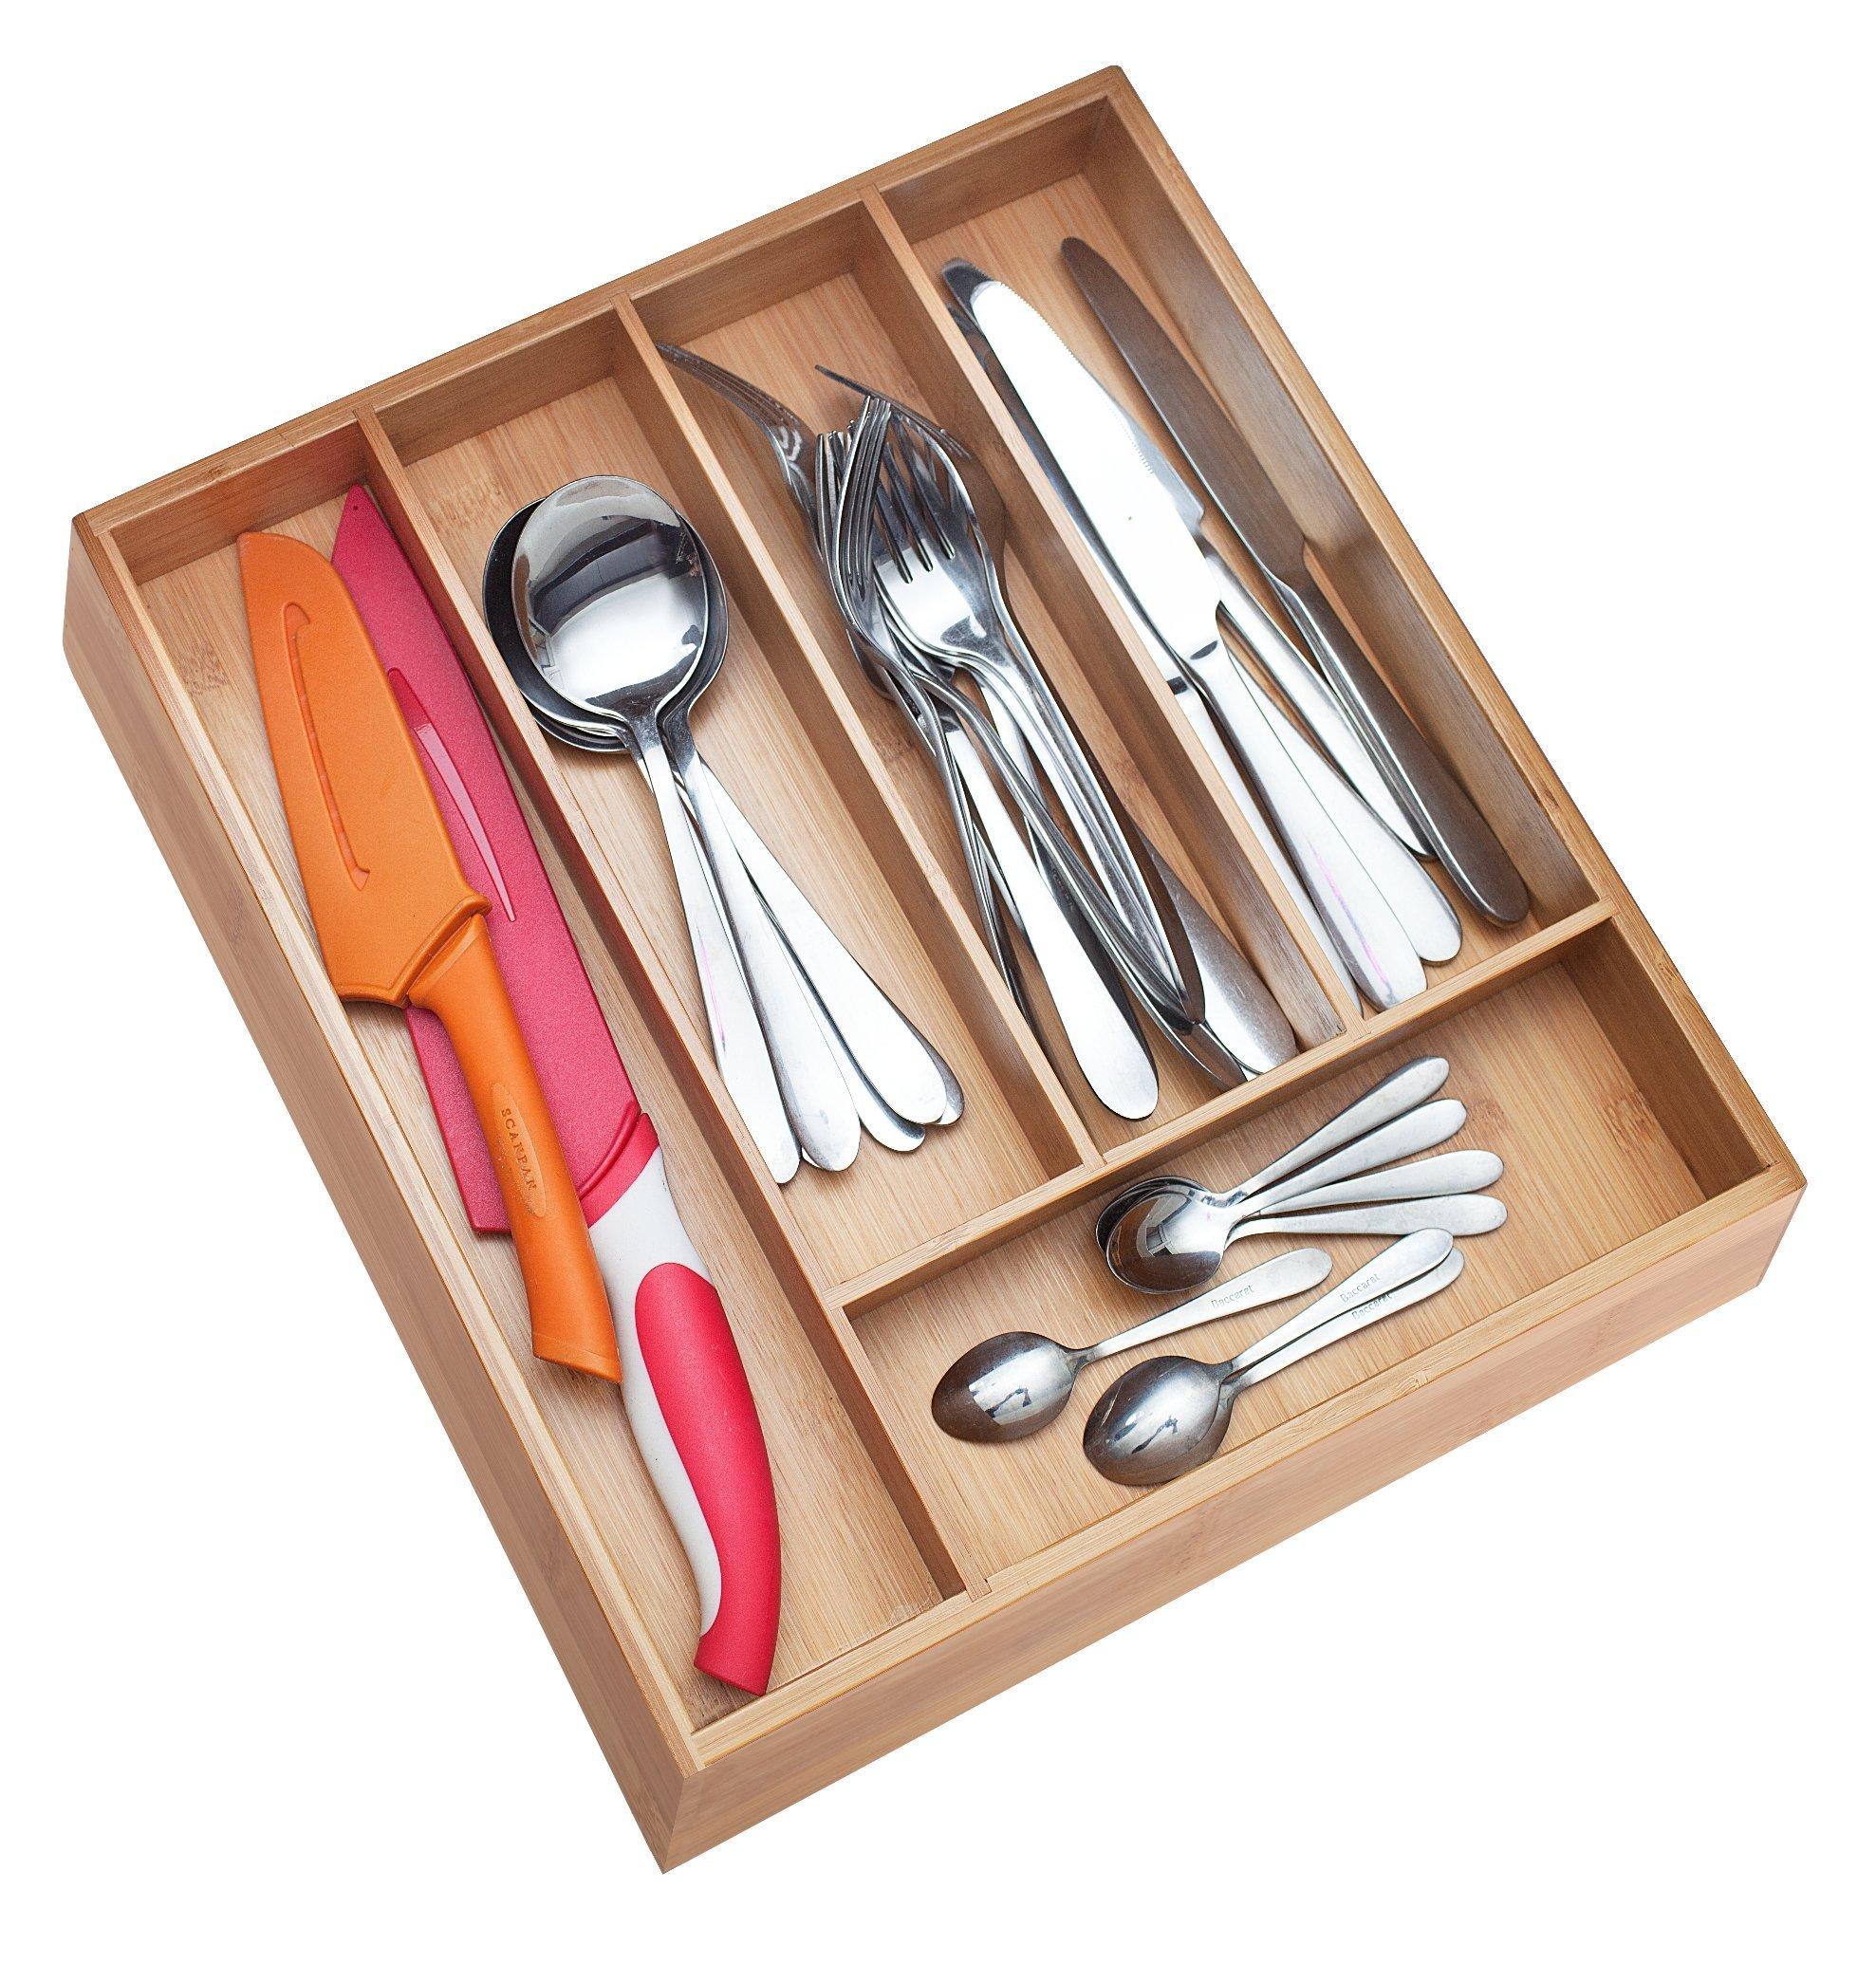 ✔ Premium, Extra Deep, Non-slip, 5-Slot Silverware Organizer| Bamboo Wood Utensil Drawer Organizer| Wooden Flatware Holder, Cutlery Tray, Kitchen Drawer Dividers by PRISTINE BAMBOO (9.8 x 13.5 x 2.4)